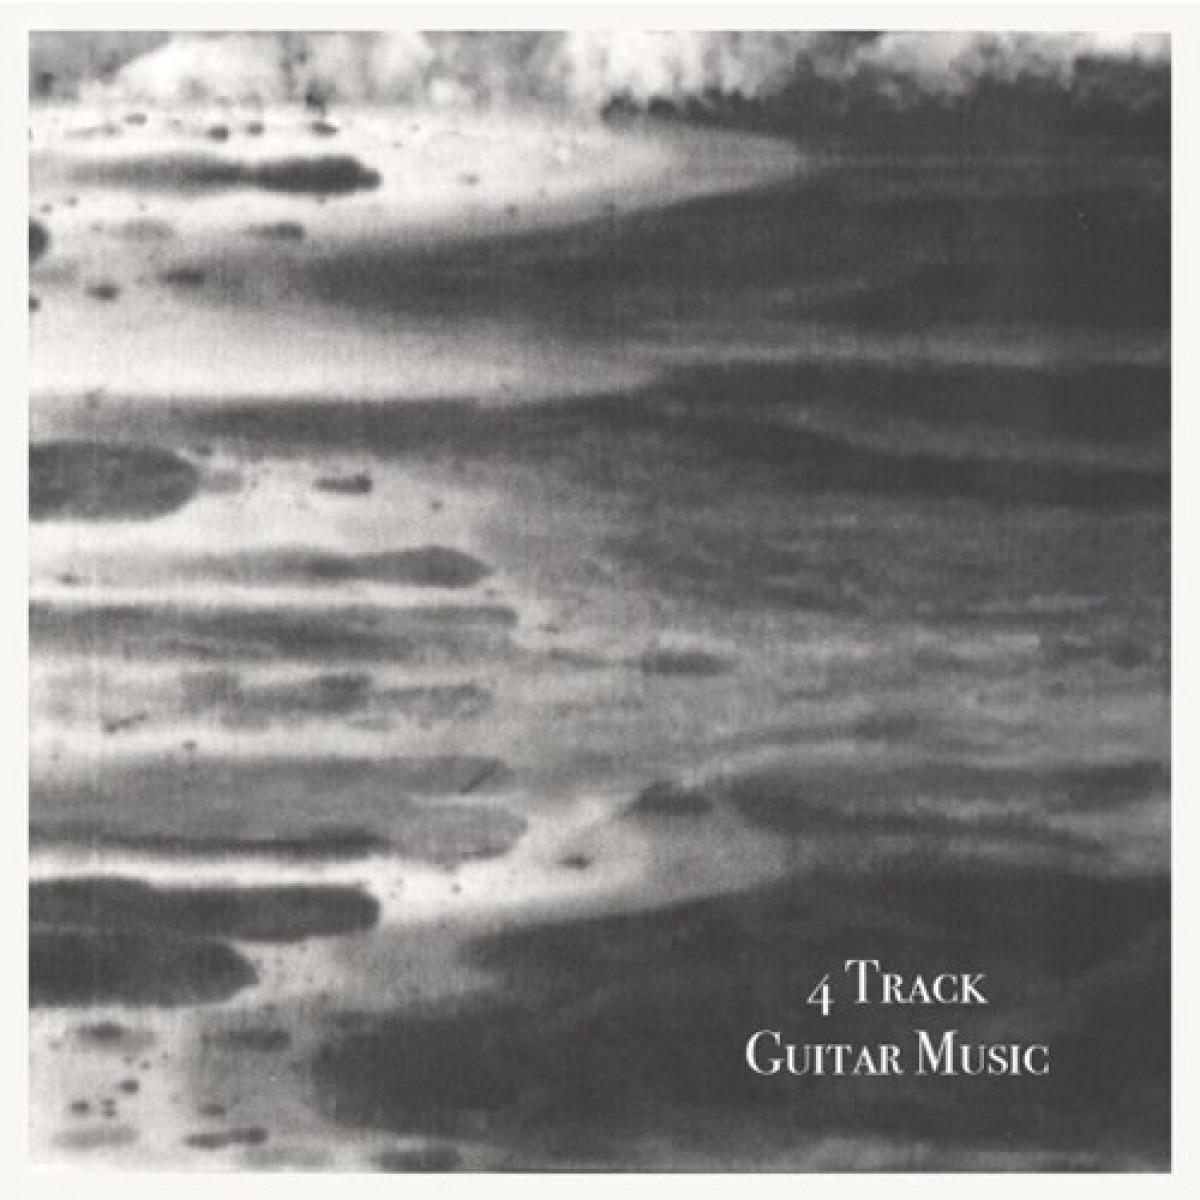 4-Track Guitar Music